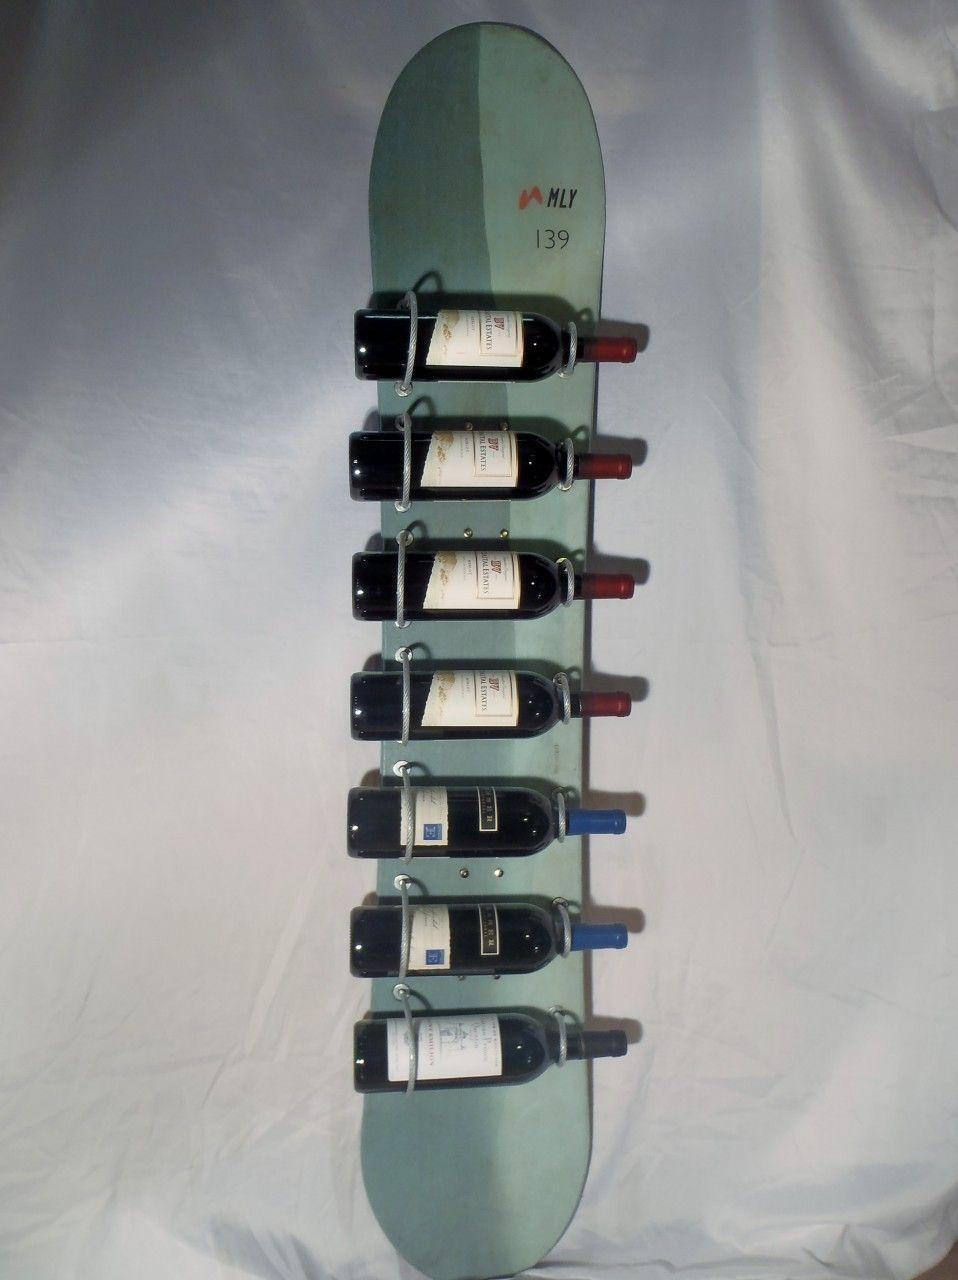 Pin By Paul Neale On Diy Crafts Snowboard Wine Rack Wine